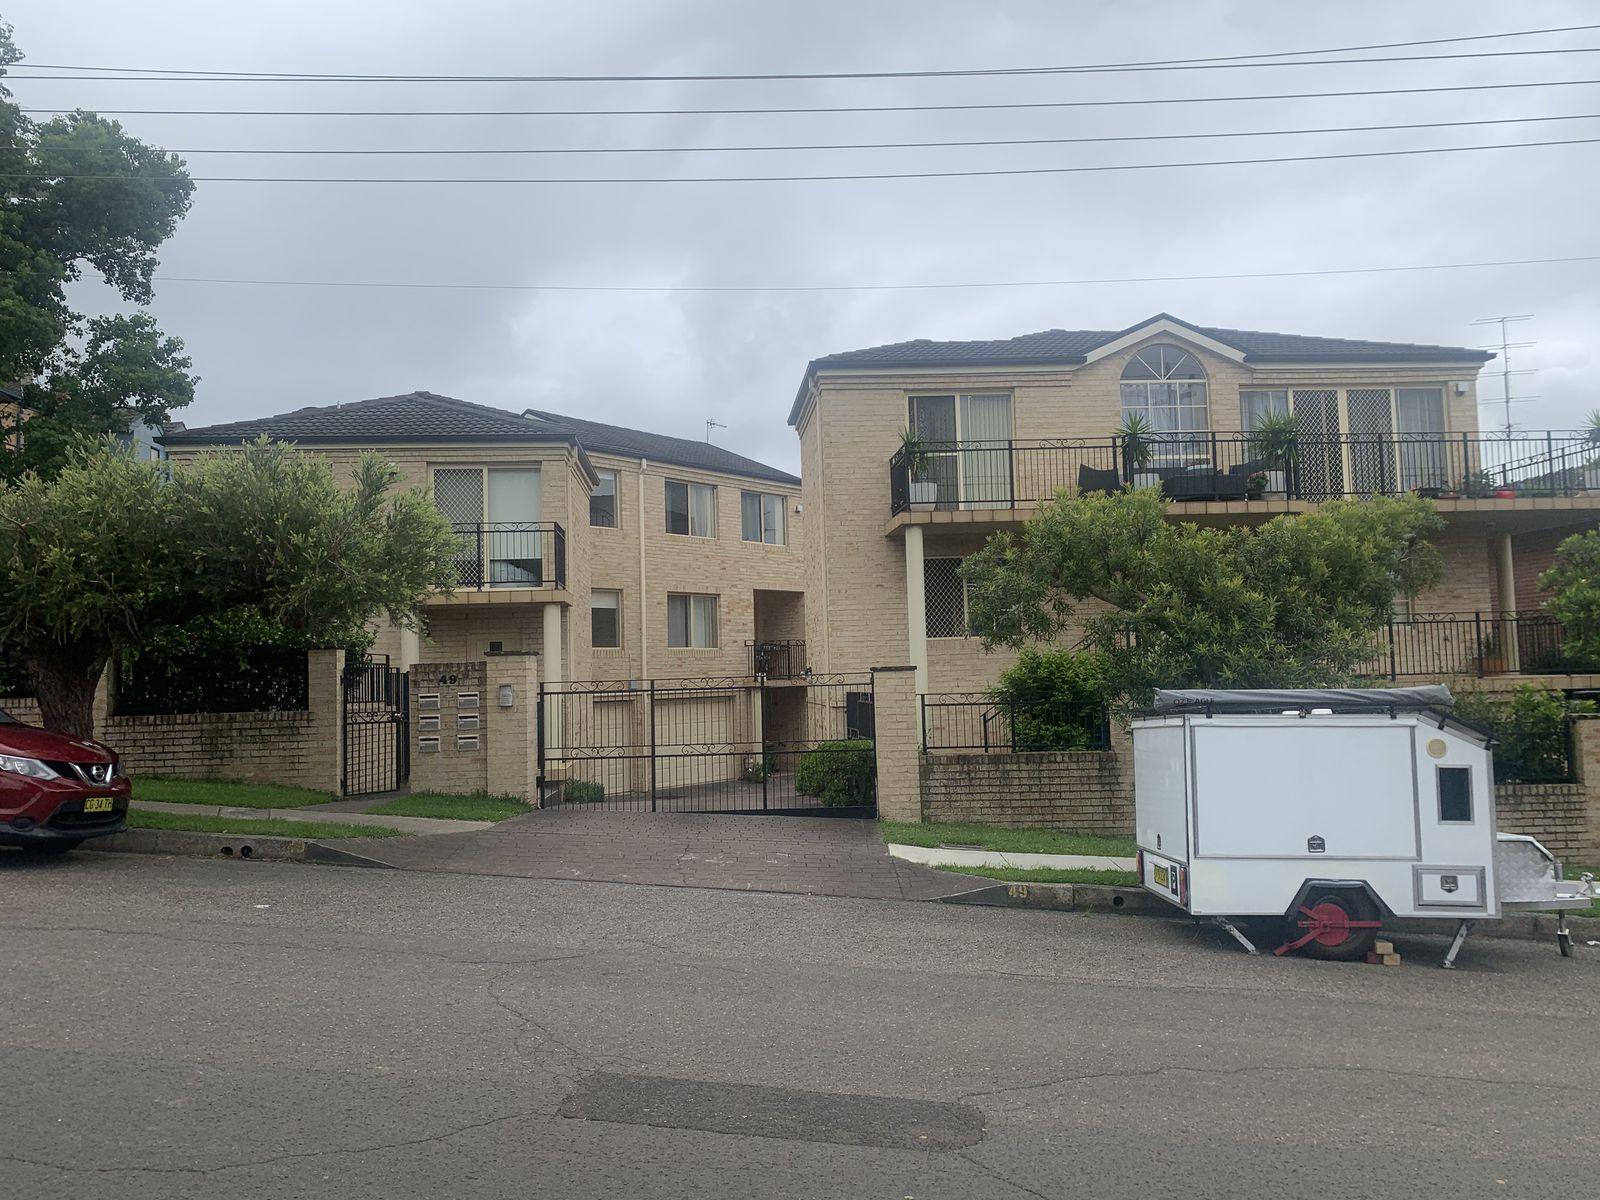 5 / 49 Gipps Street, North Wollongong